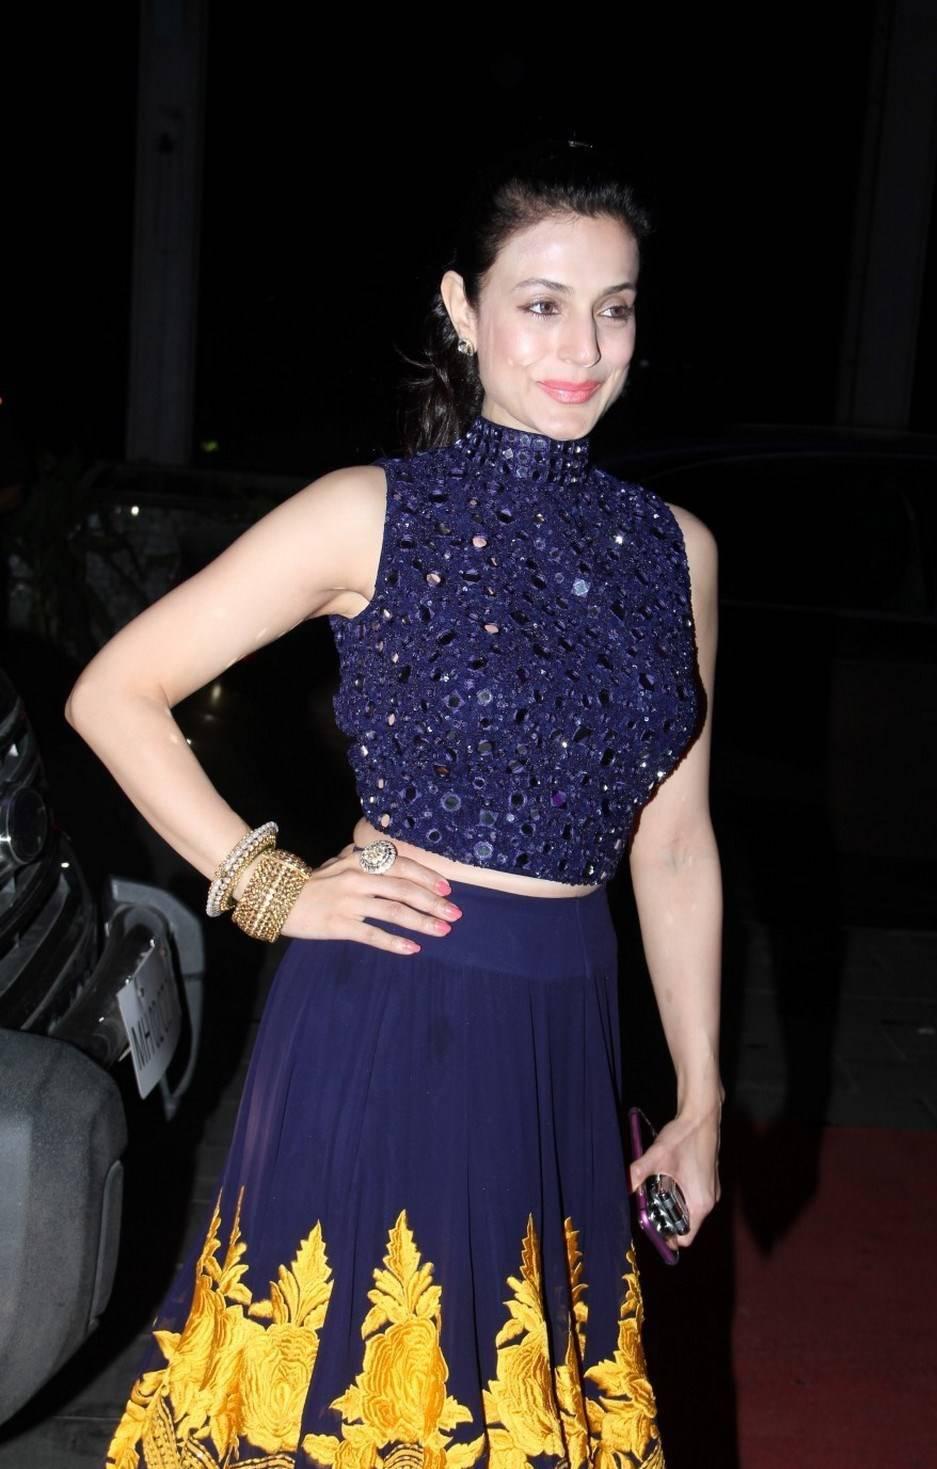 Ameesha Patel Stills In Blue Dress At Wedding Reception